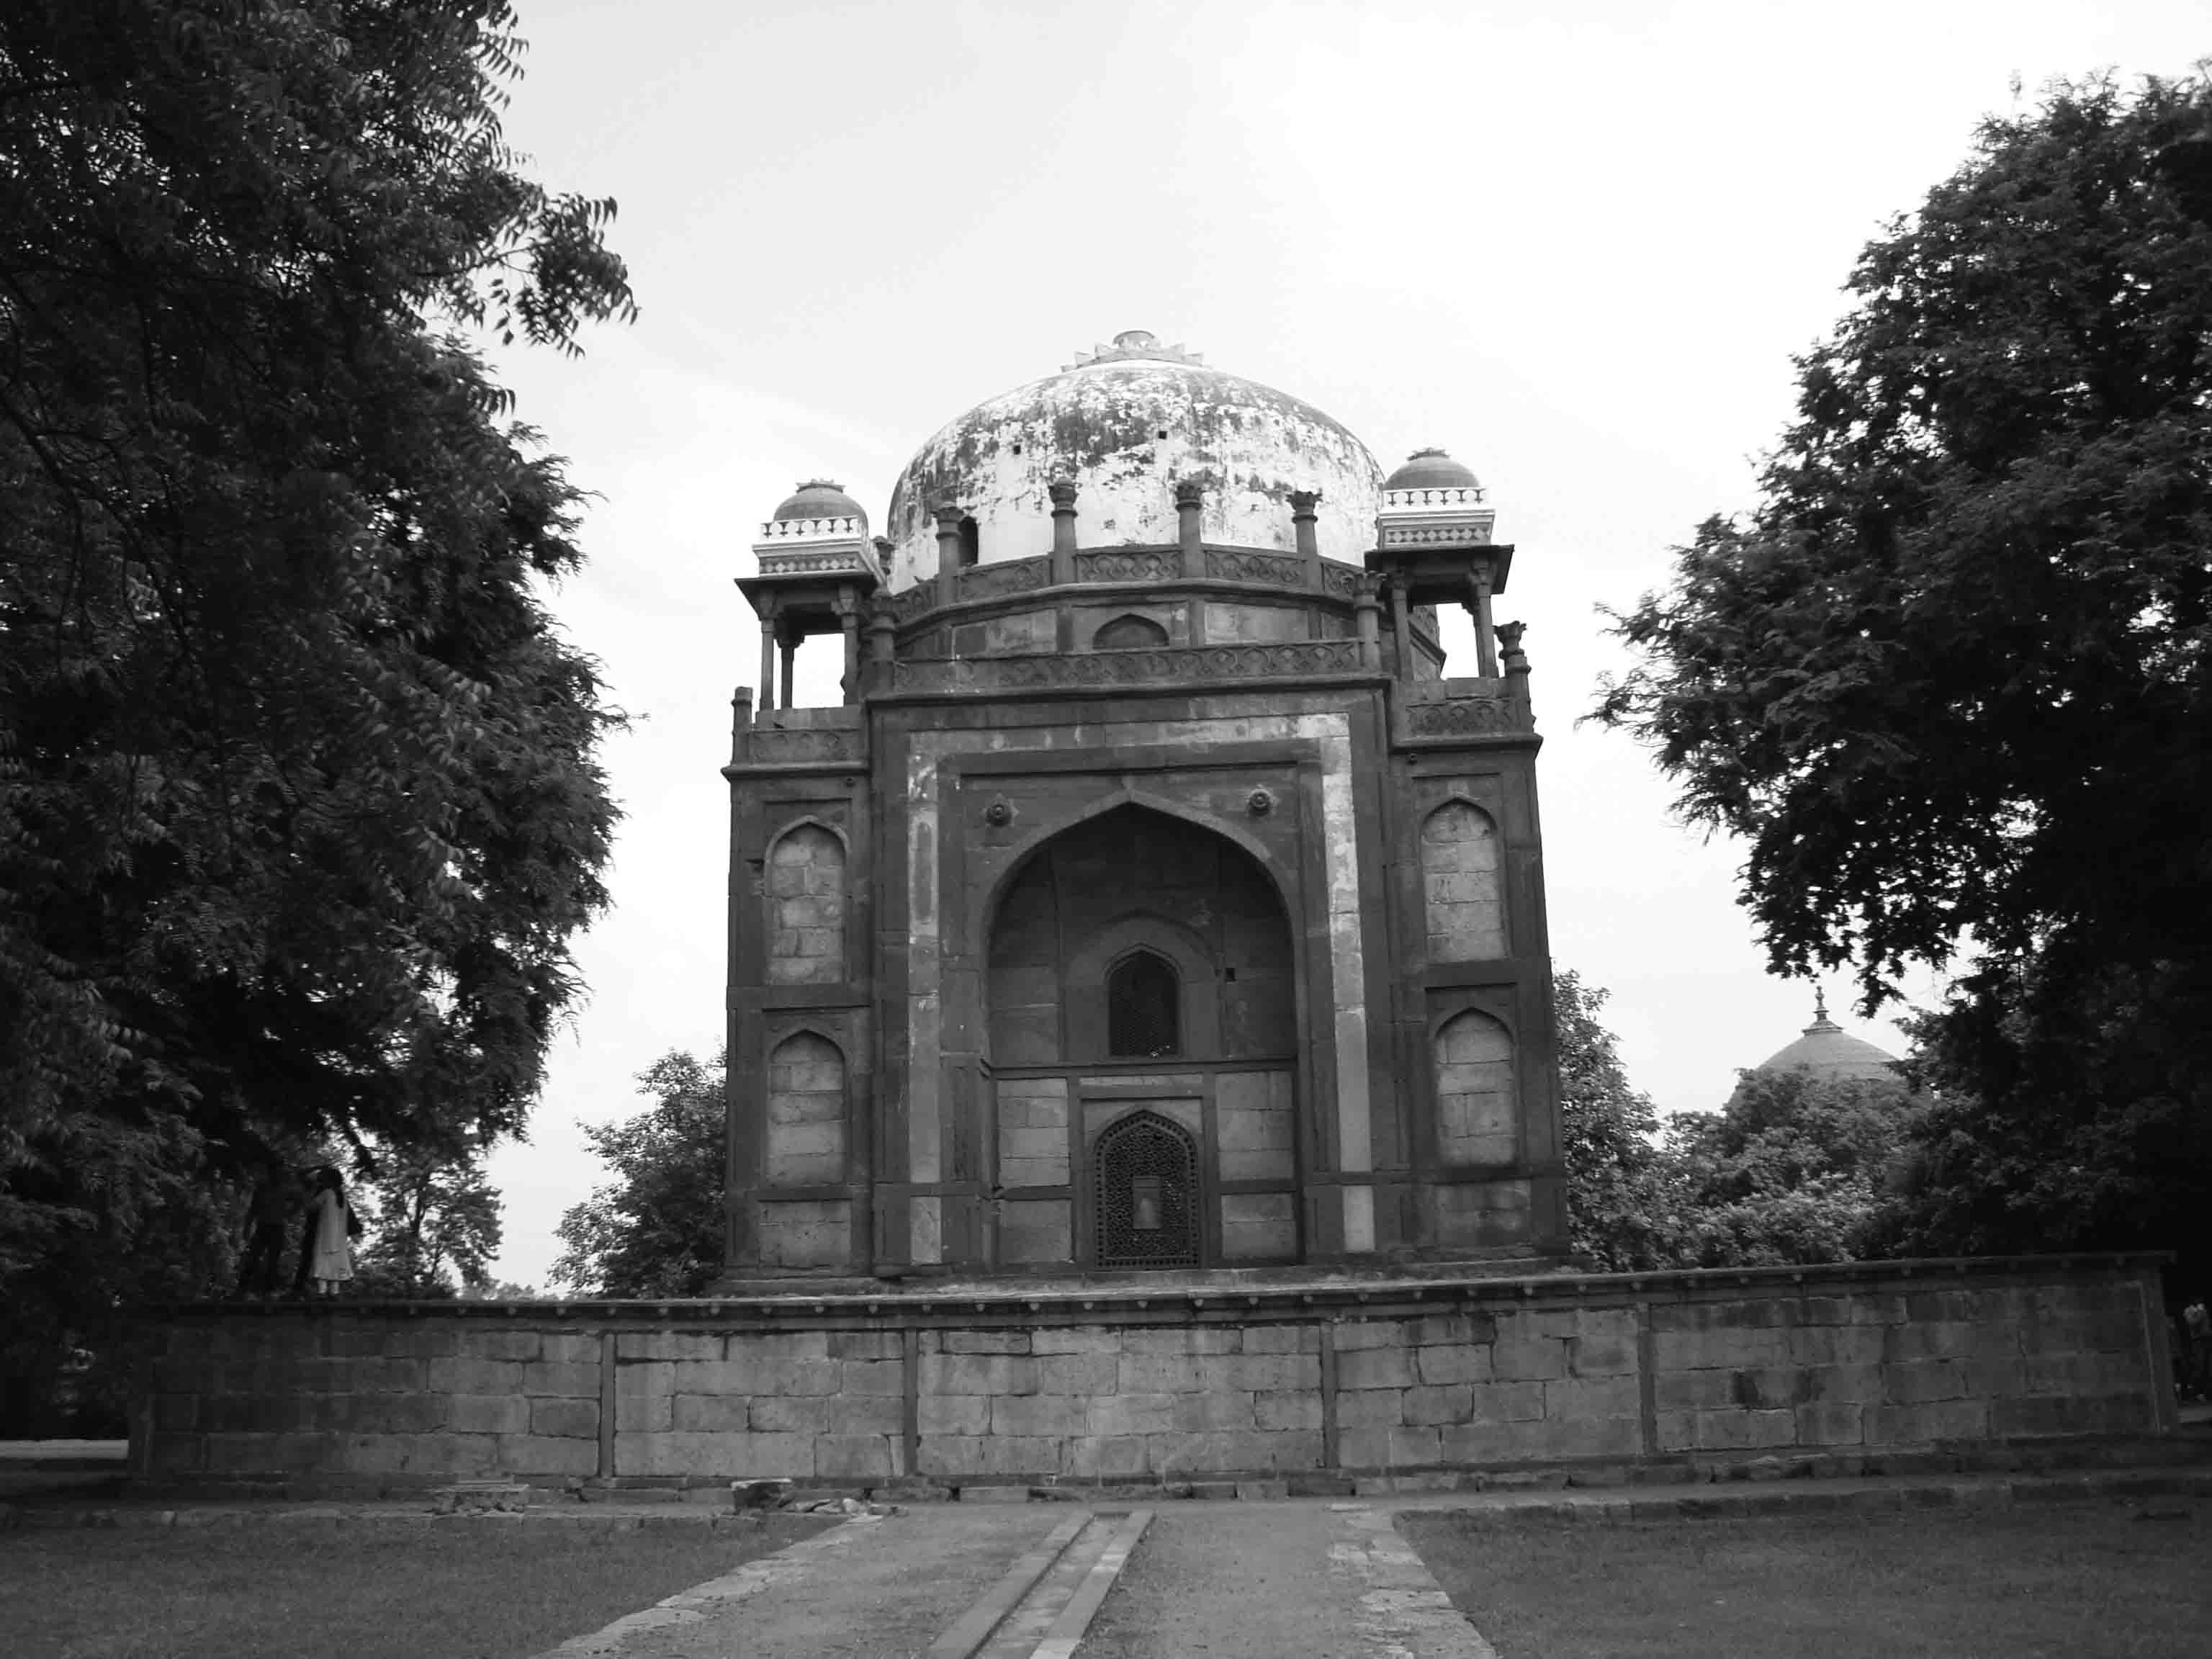 File:Humayun's Tomb x12 jpg - Wikimedia Commons